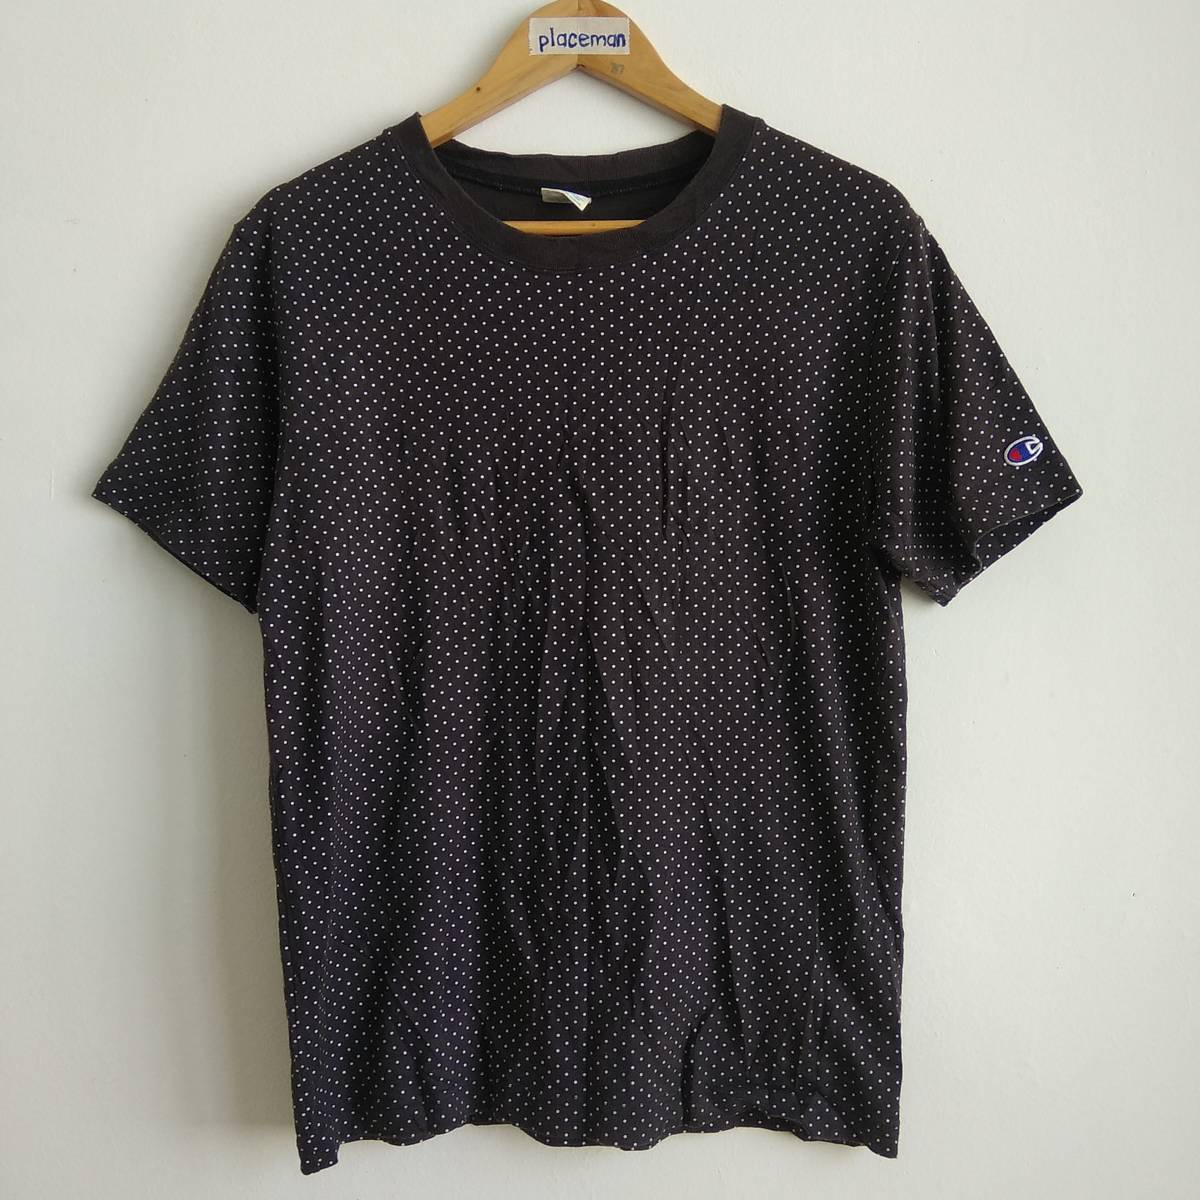 7c6b8cd505de Champion × Streetwear ×. champion polka dot tee shirt authentic american  athletic apparel. Size: US M / EU 48-50 ...